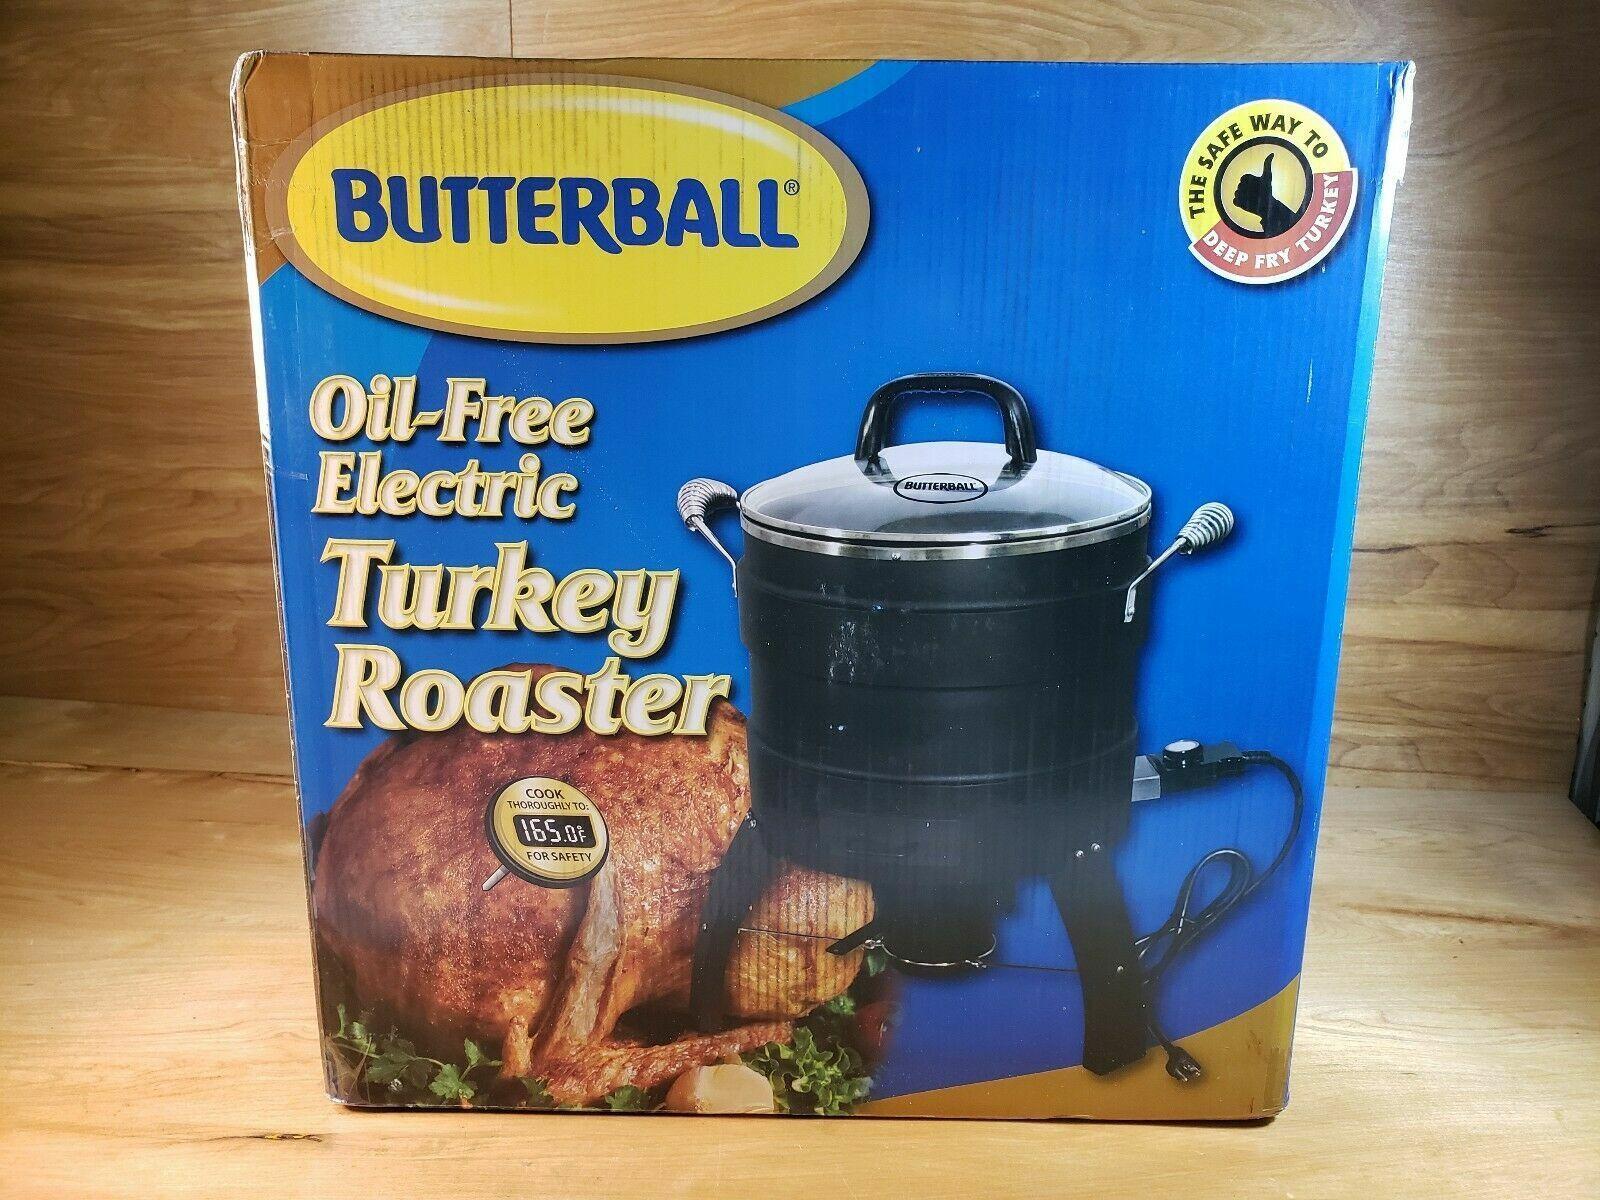 Masterbuilt Butterball Oil-Free Electric Turkey Roaster Frye